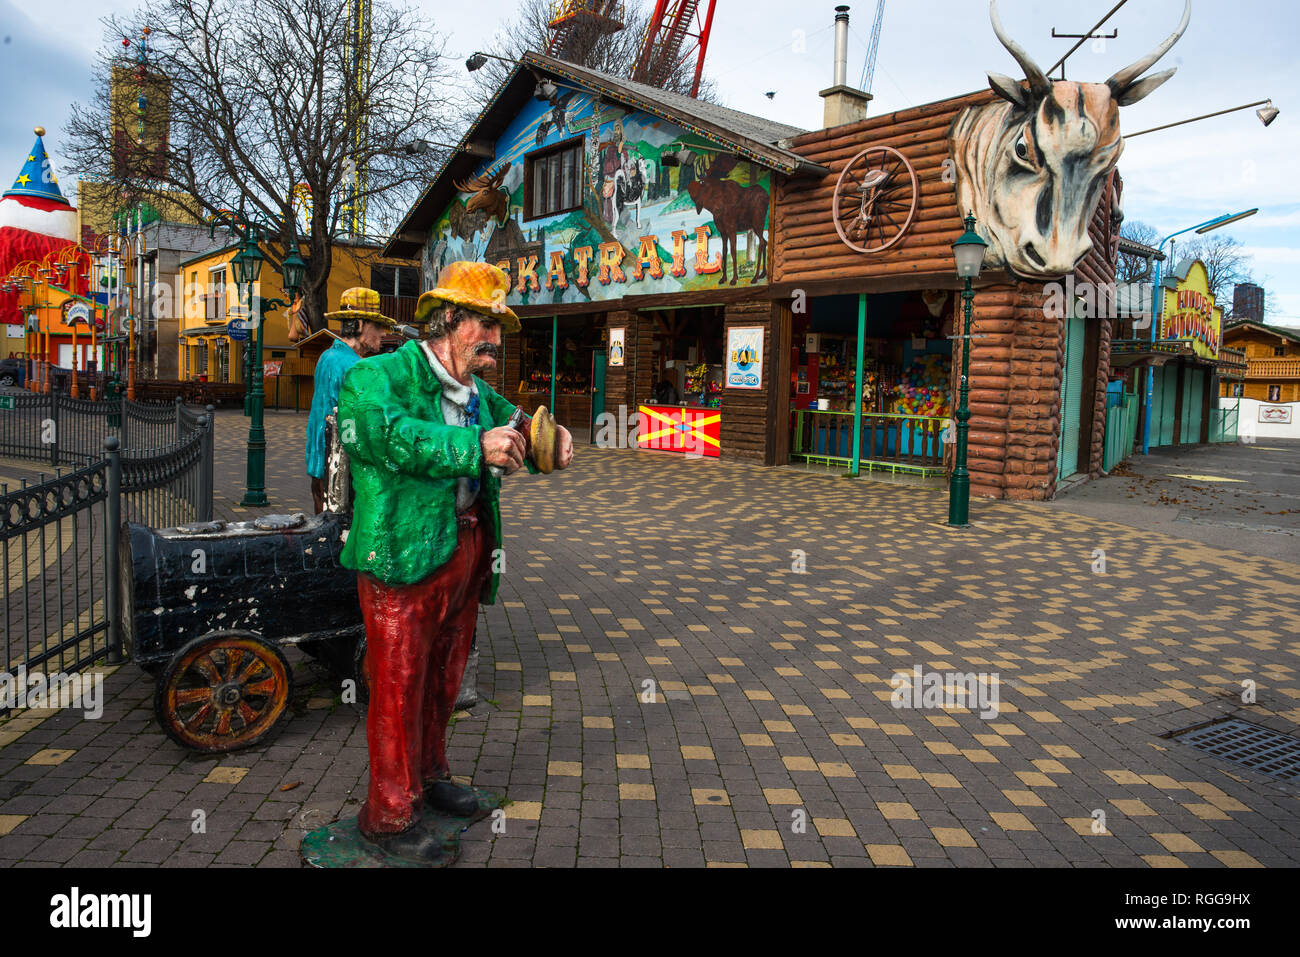 Prater amusements park, Leopoldstadt, Vienna, Austria. - Stock Image